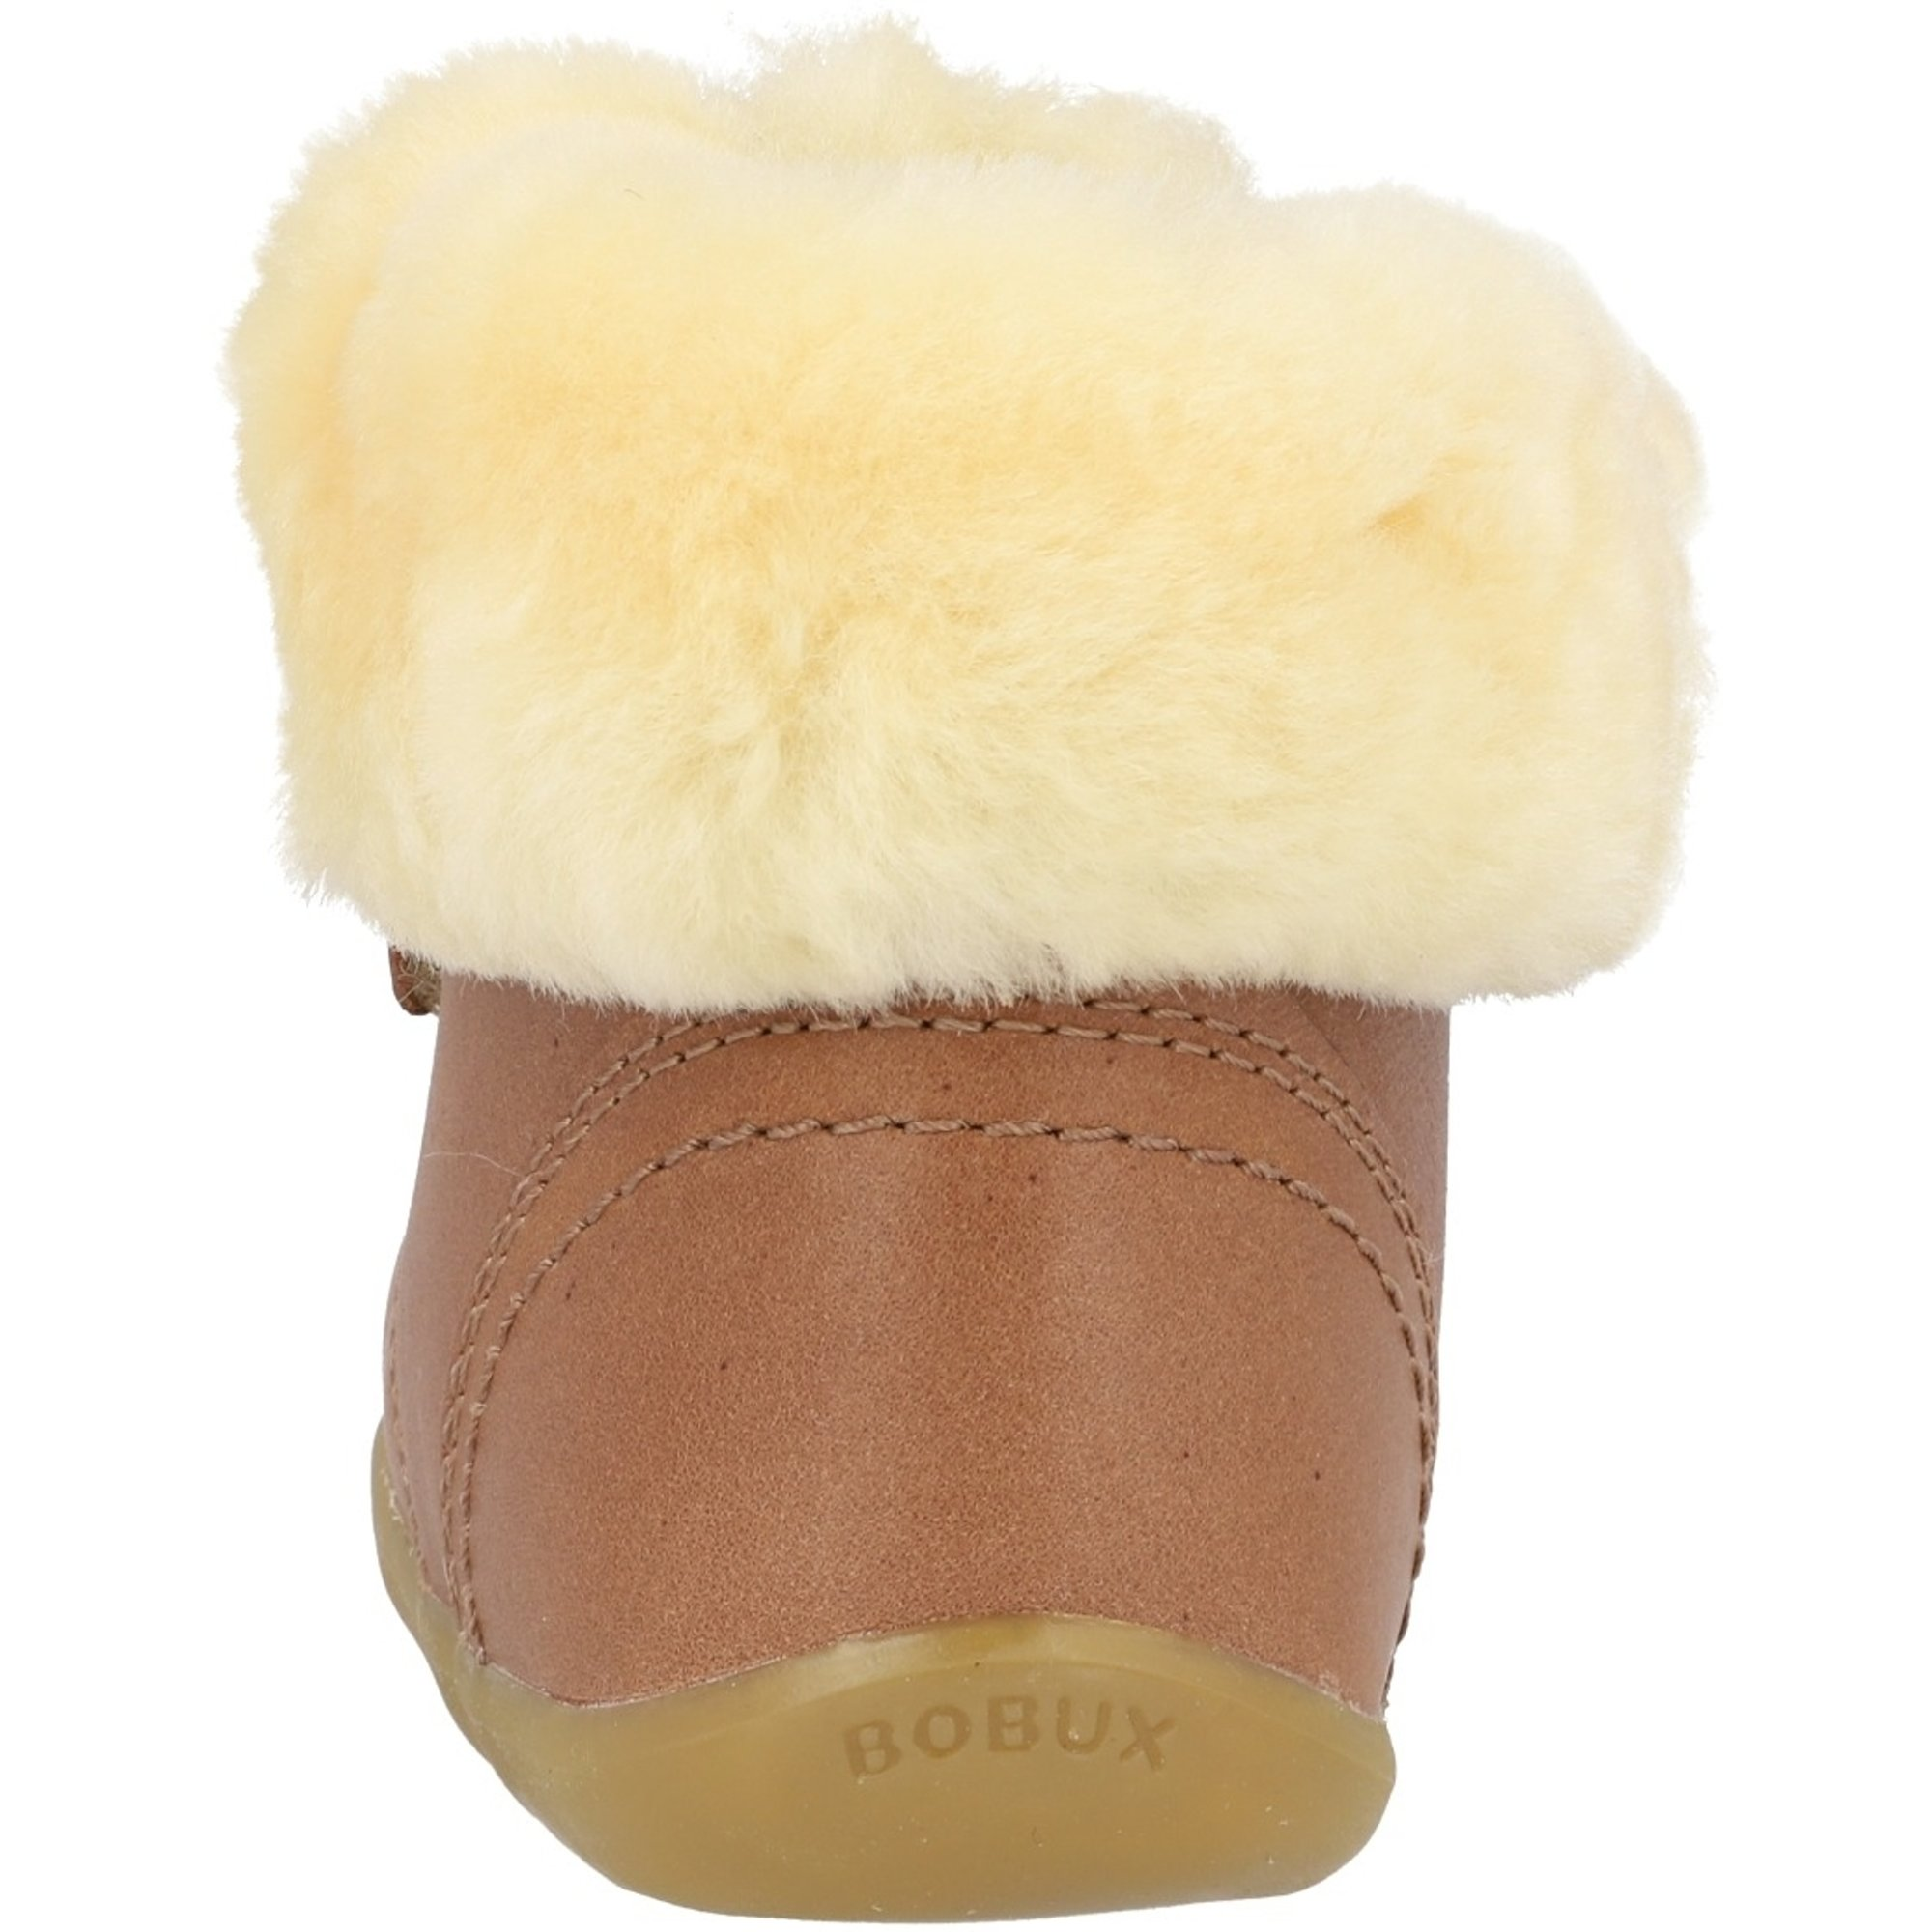 Bobux Step Up Desert Arctic Caramel Quickdry Vintage-Look Leather